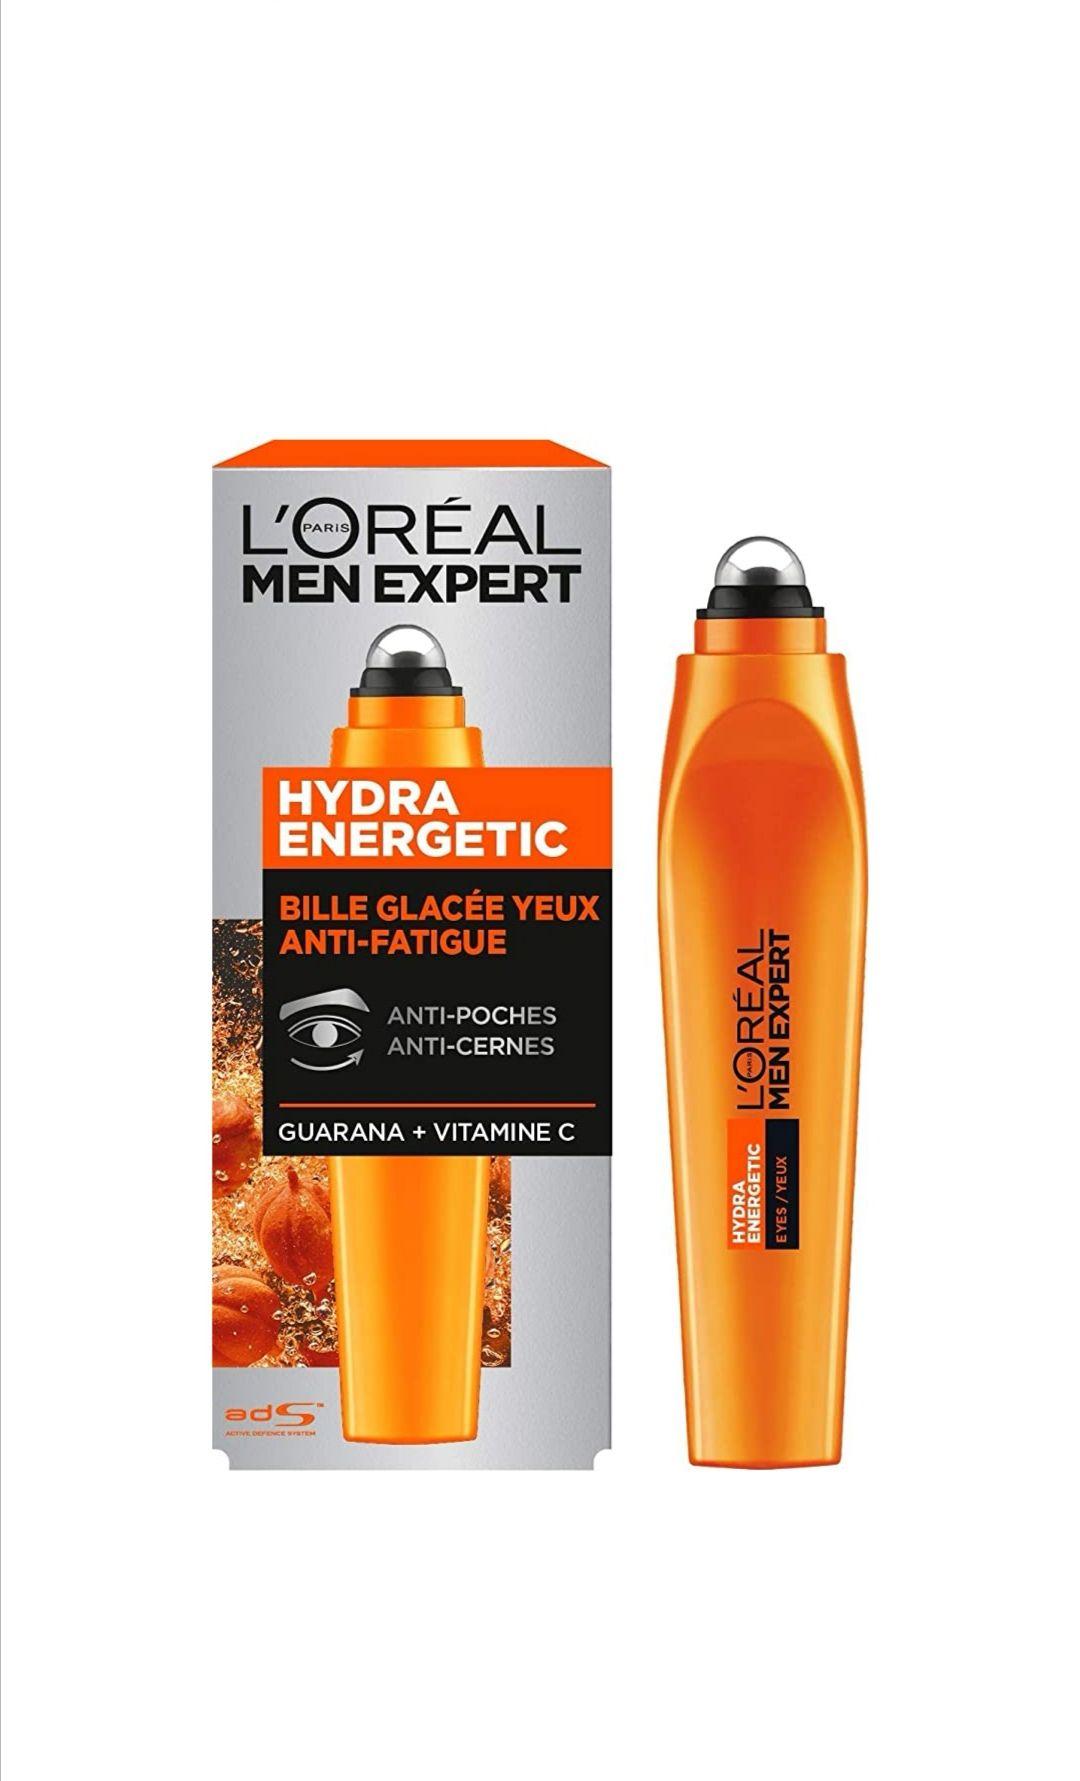 Bille anti-cernes & anti-poches homme L'Oréal Men Expert Hydra Energetic - 10 ml